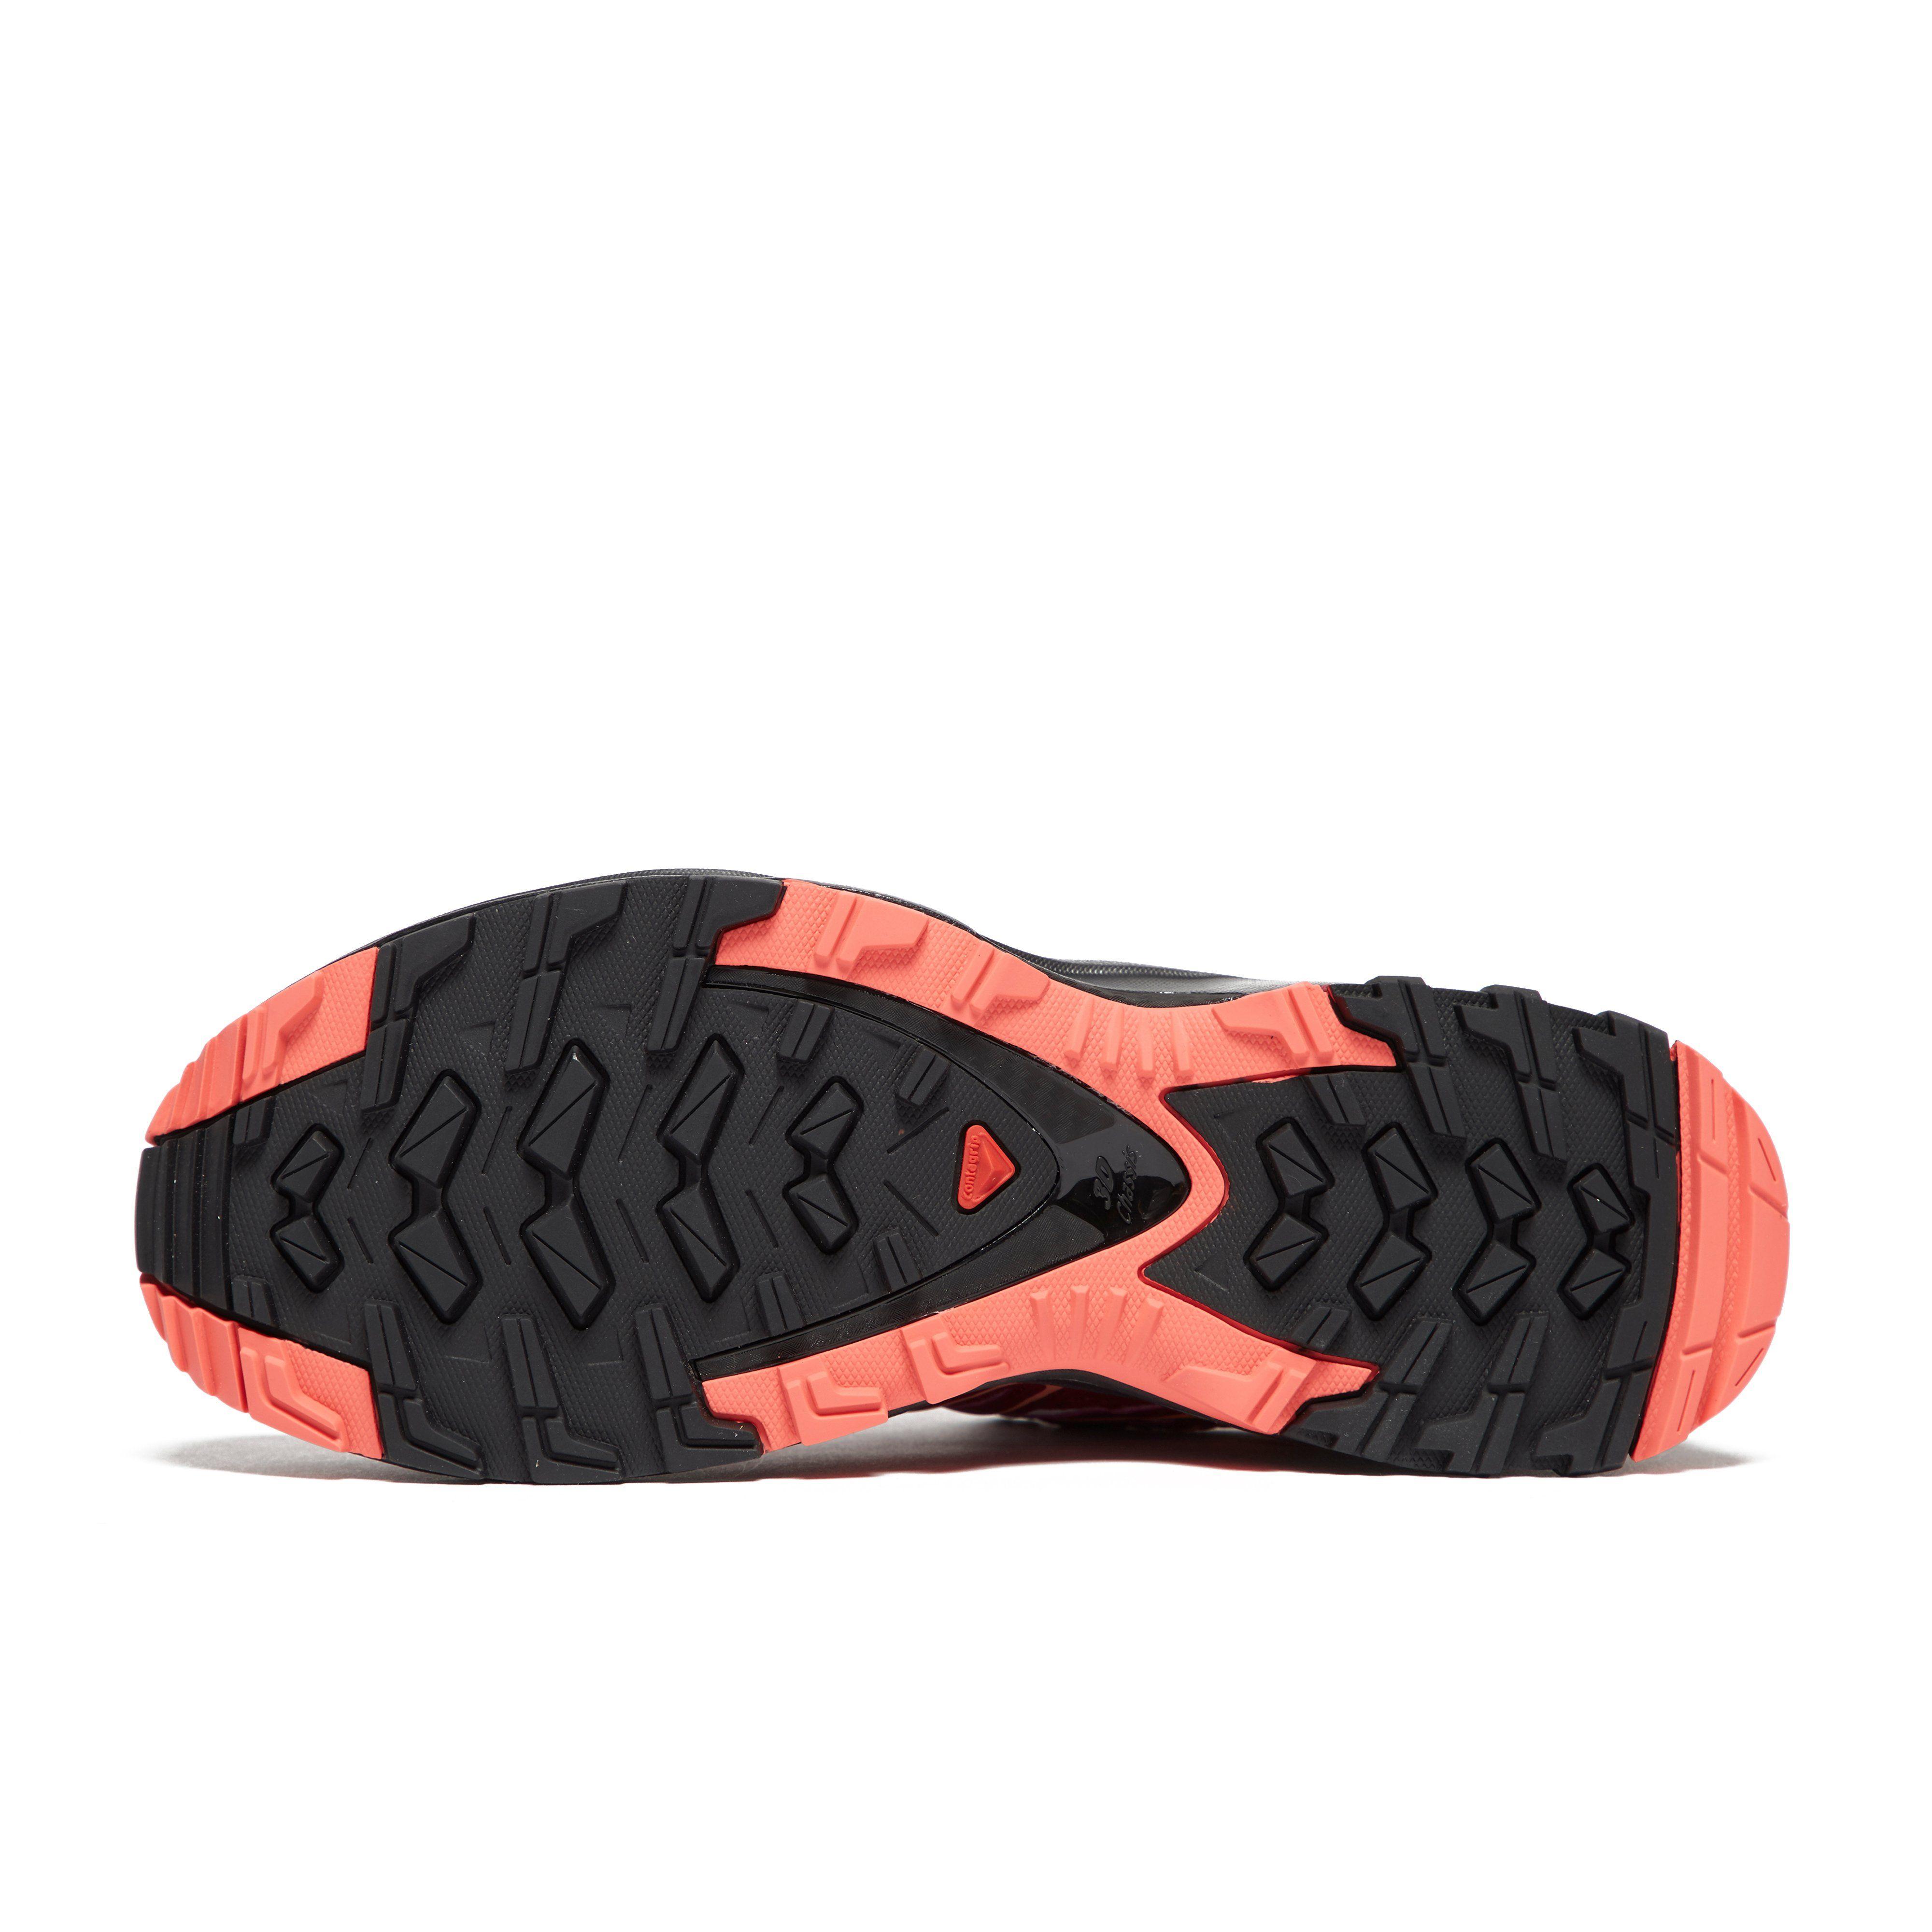 Salomon XA Pro 3D Women's Trail Running Shoes